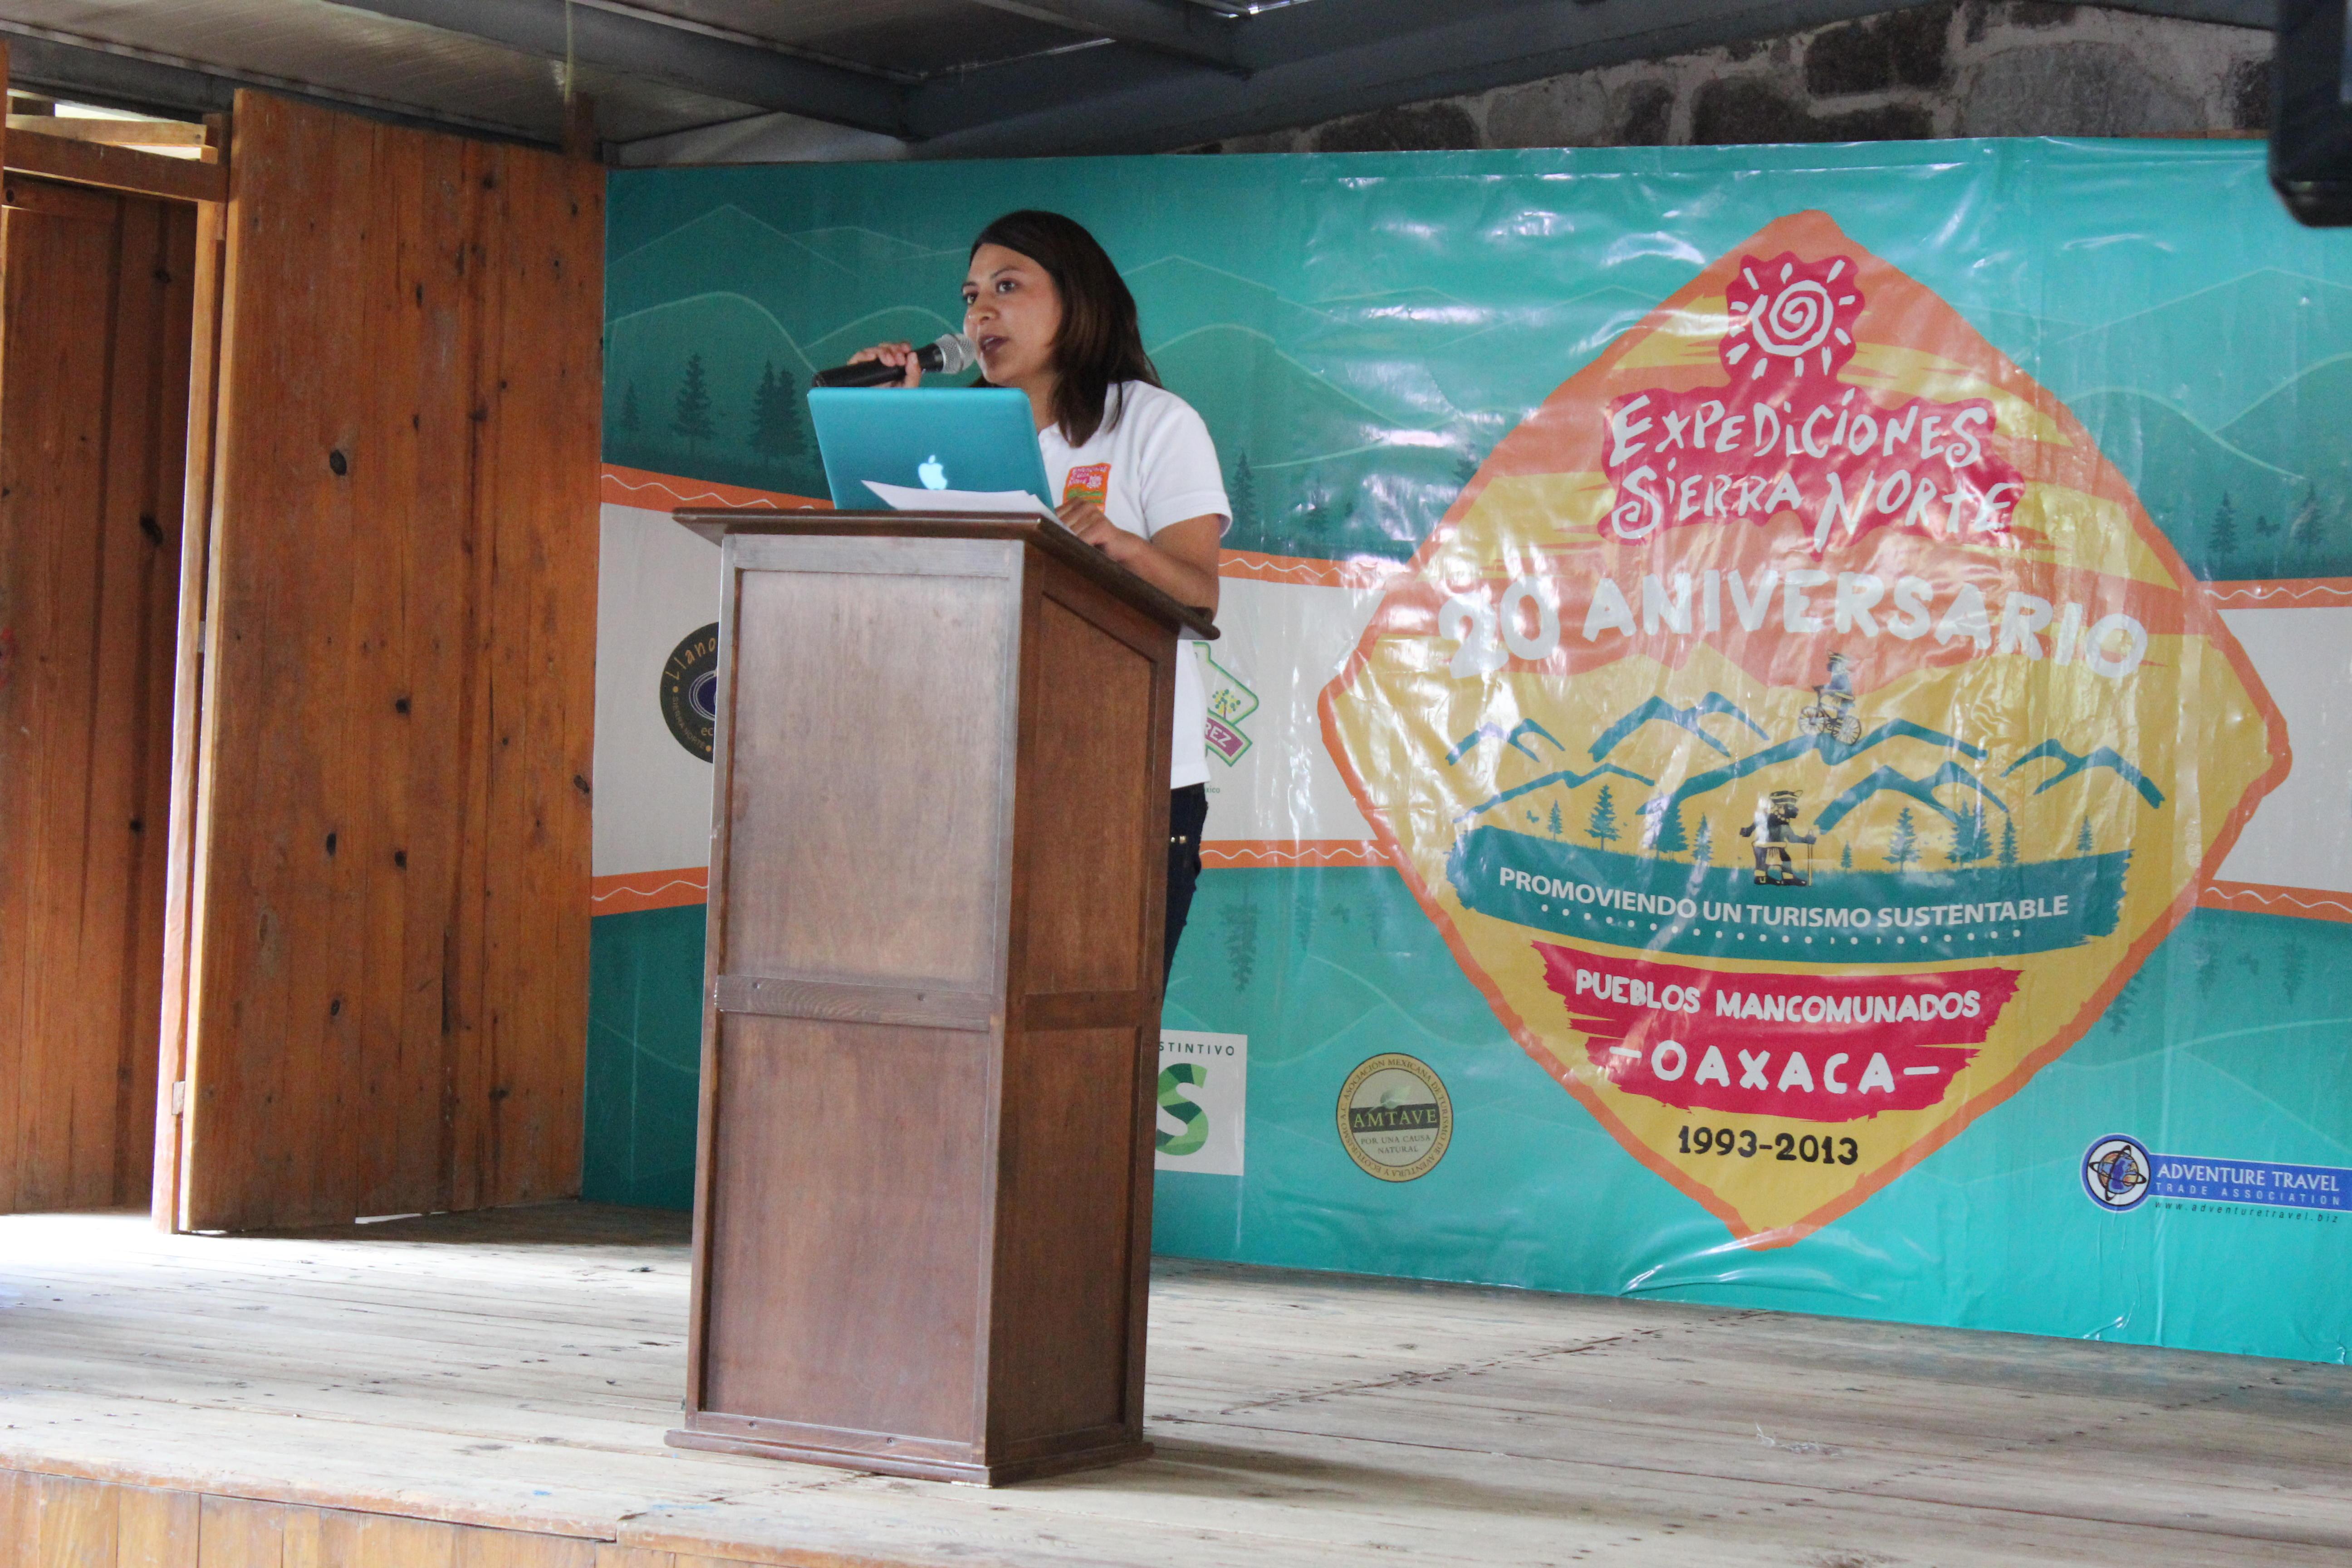 angelica-speaking-podium.JPG